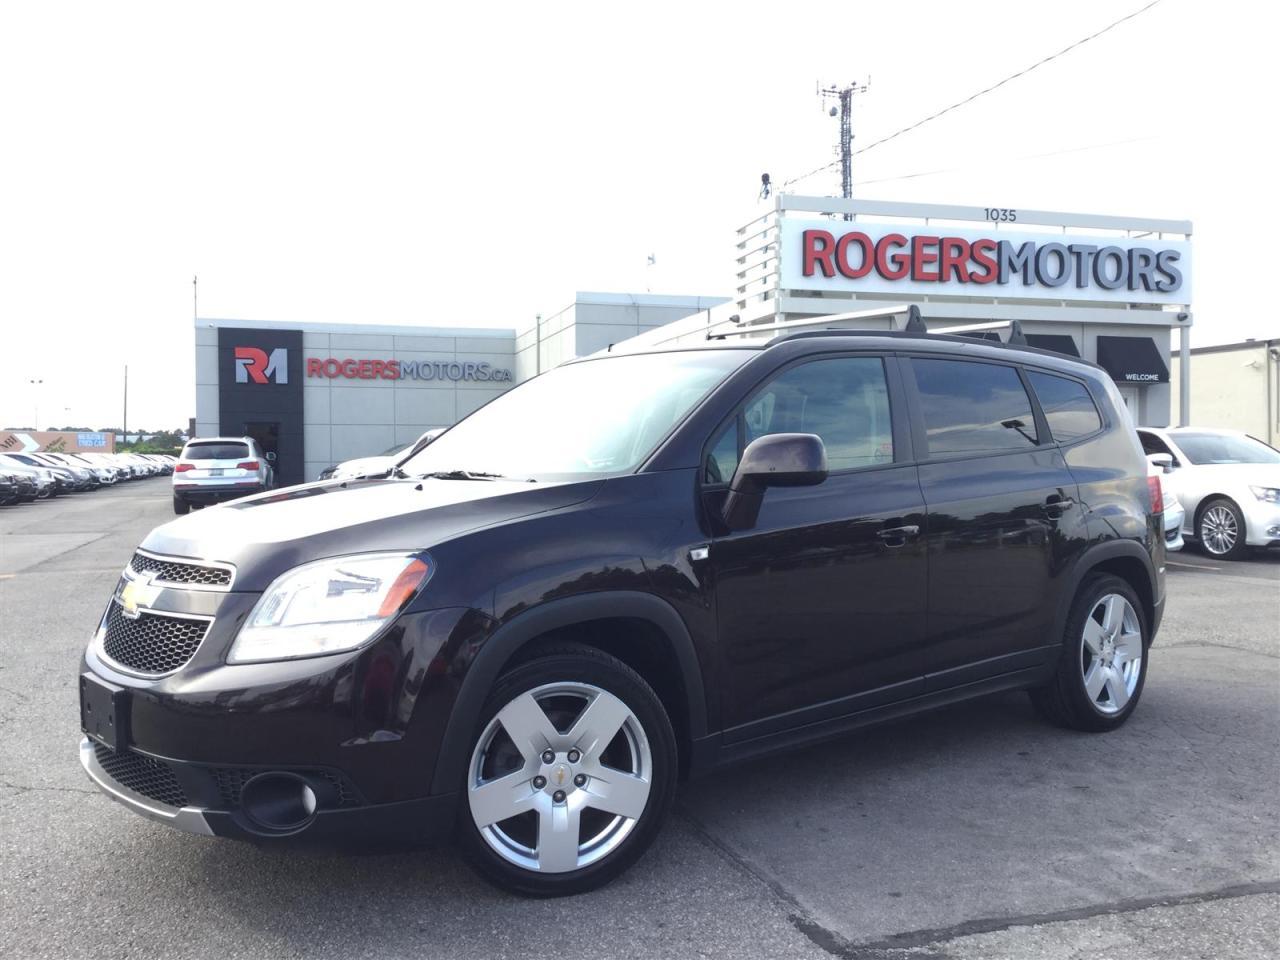 Used 2013 Chevrolet Orlando LT - BLUETOOTH - REVERSE SENSORS for Sale in Oakville, Ontario ...